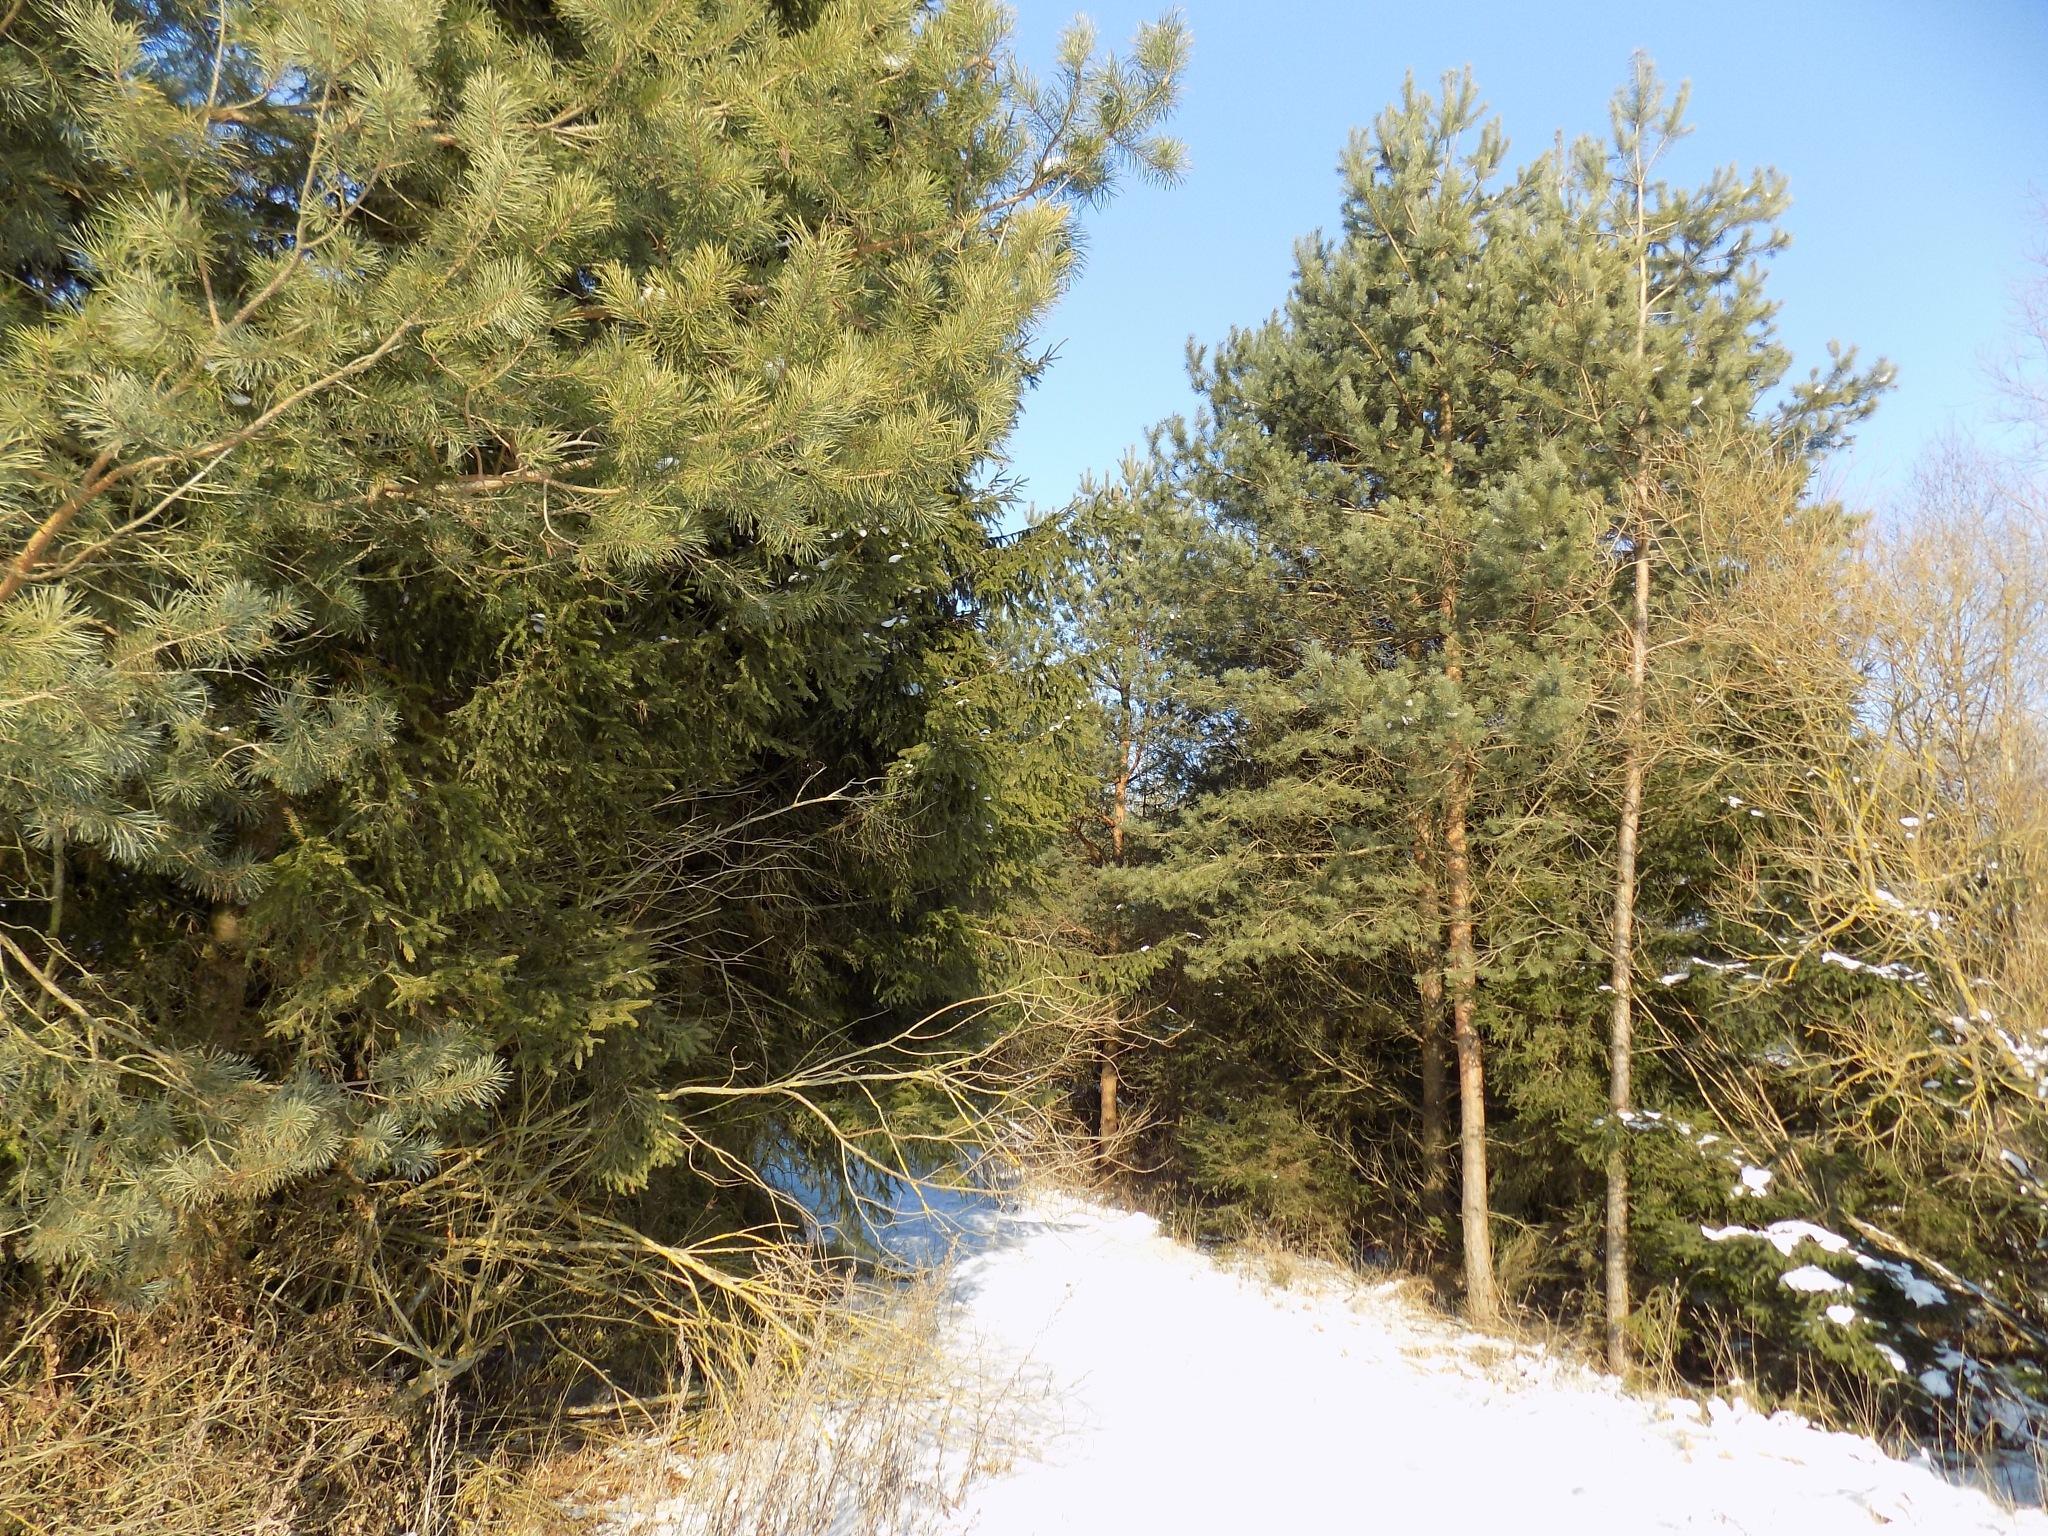 Nature in winter by uzkuraitiene62